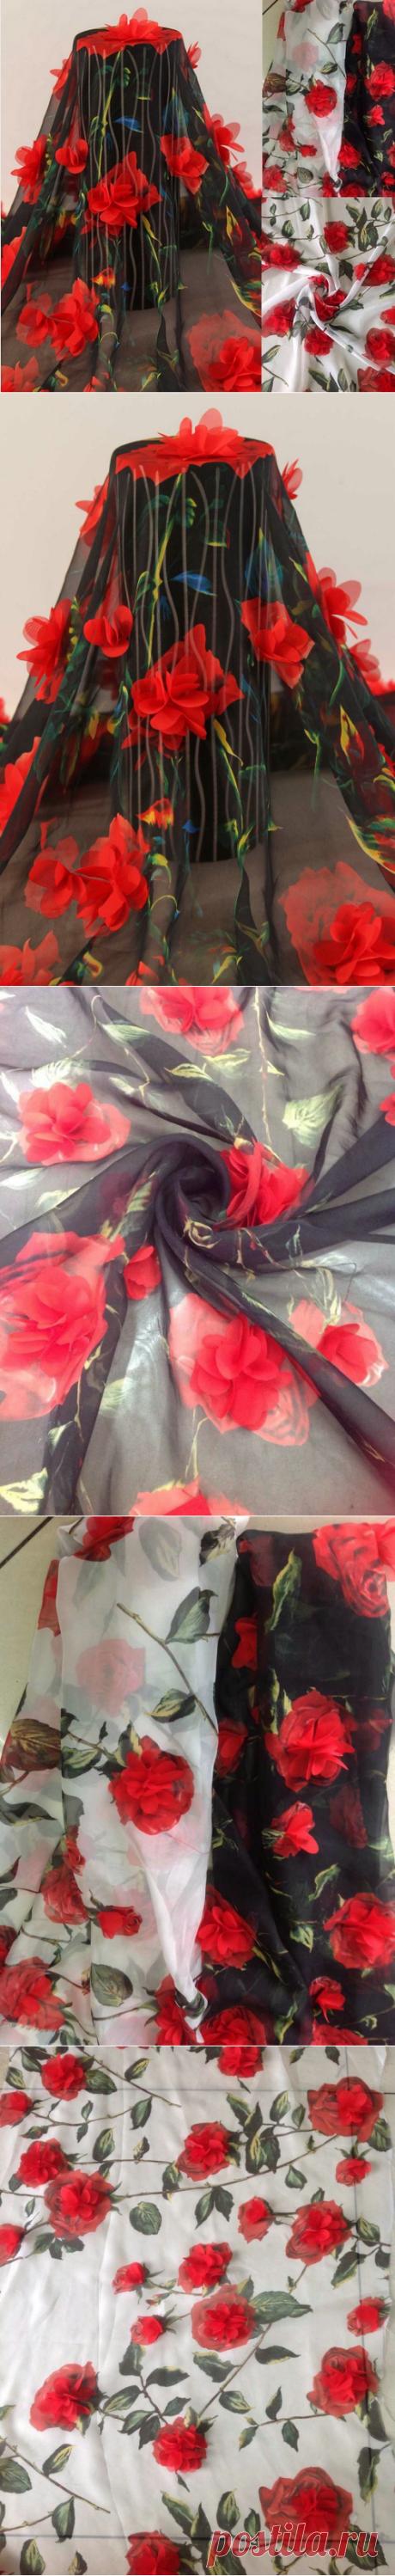 f880ff4e3bb 3D Розовыми Цветами Вышивка Шифон Кружевной Ткани